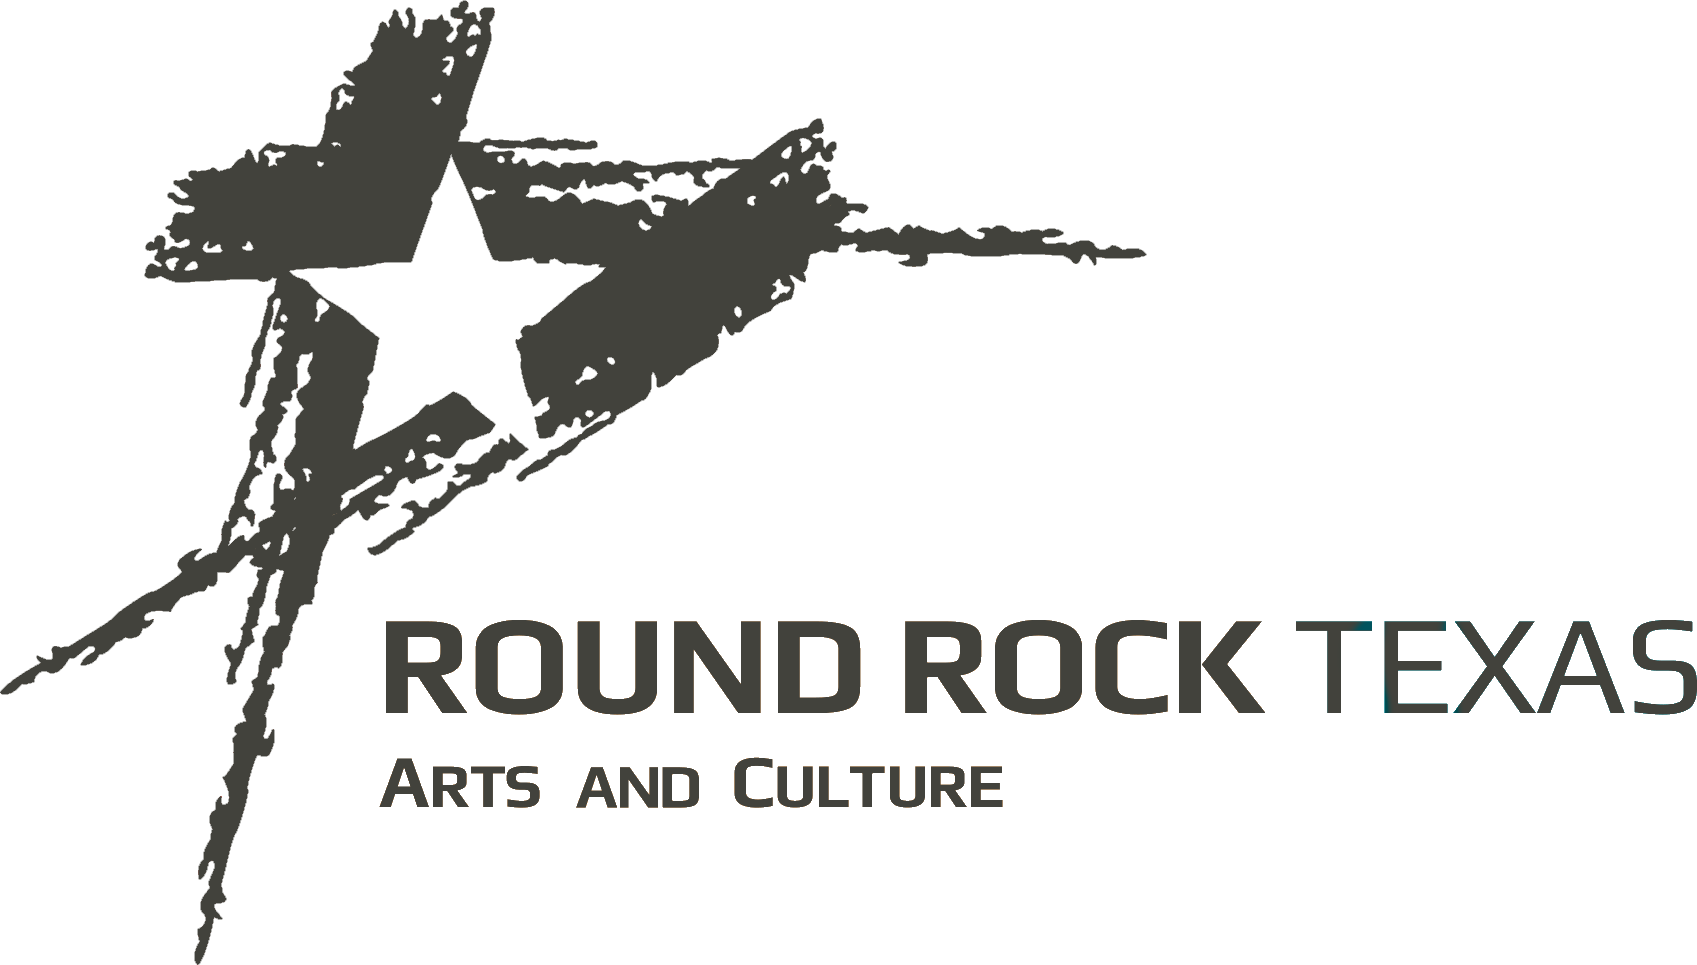 Round Rock - Arts & Culture